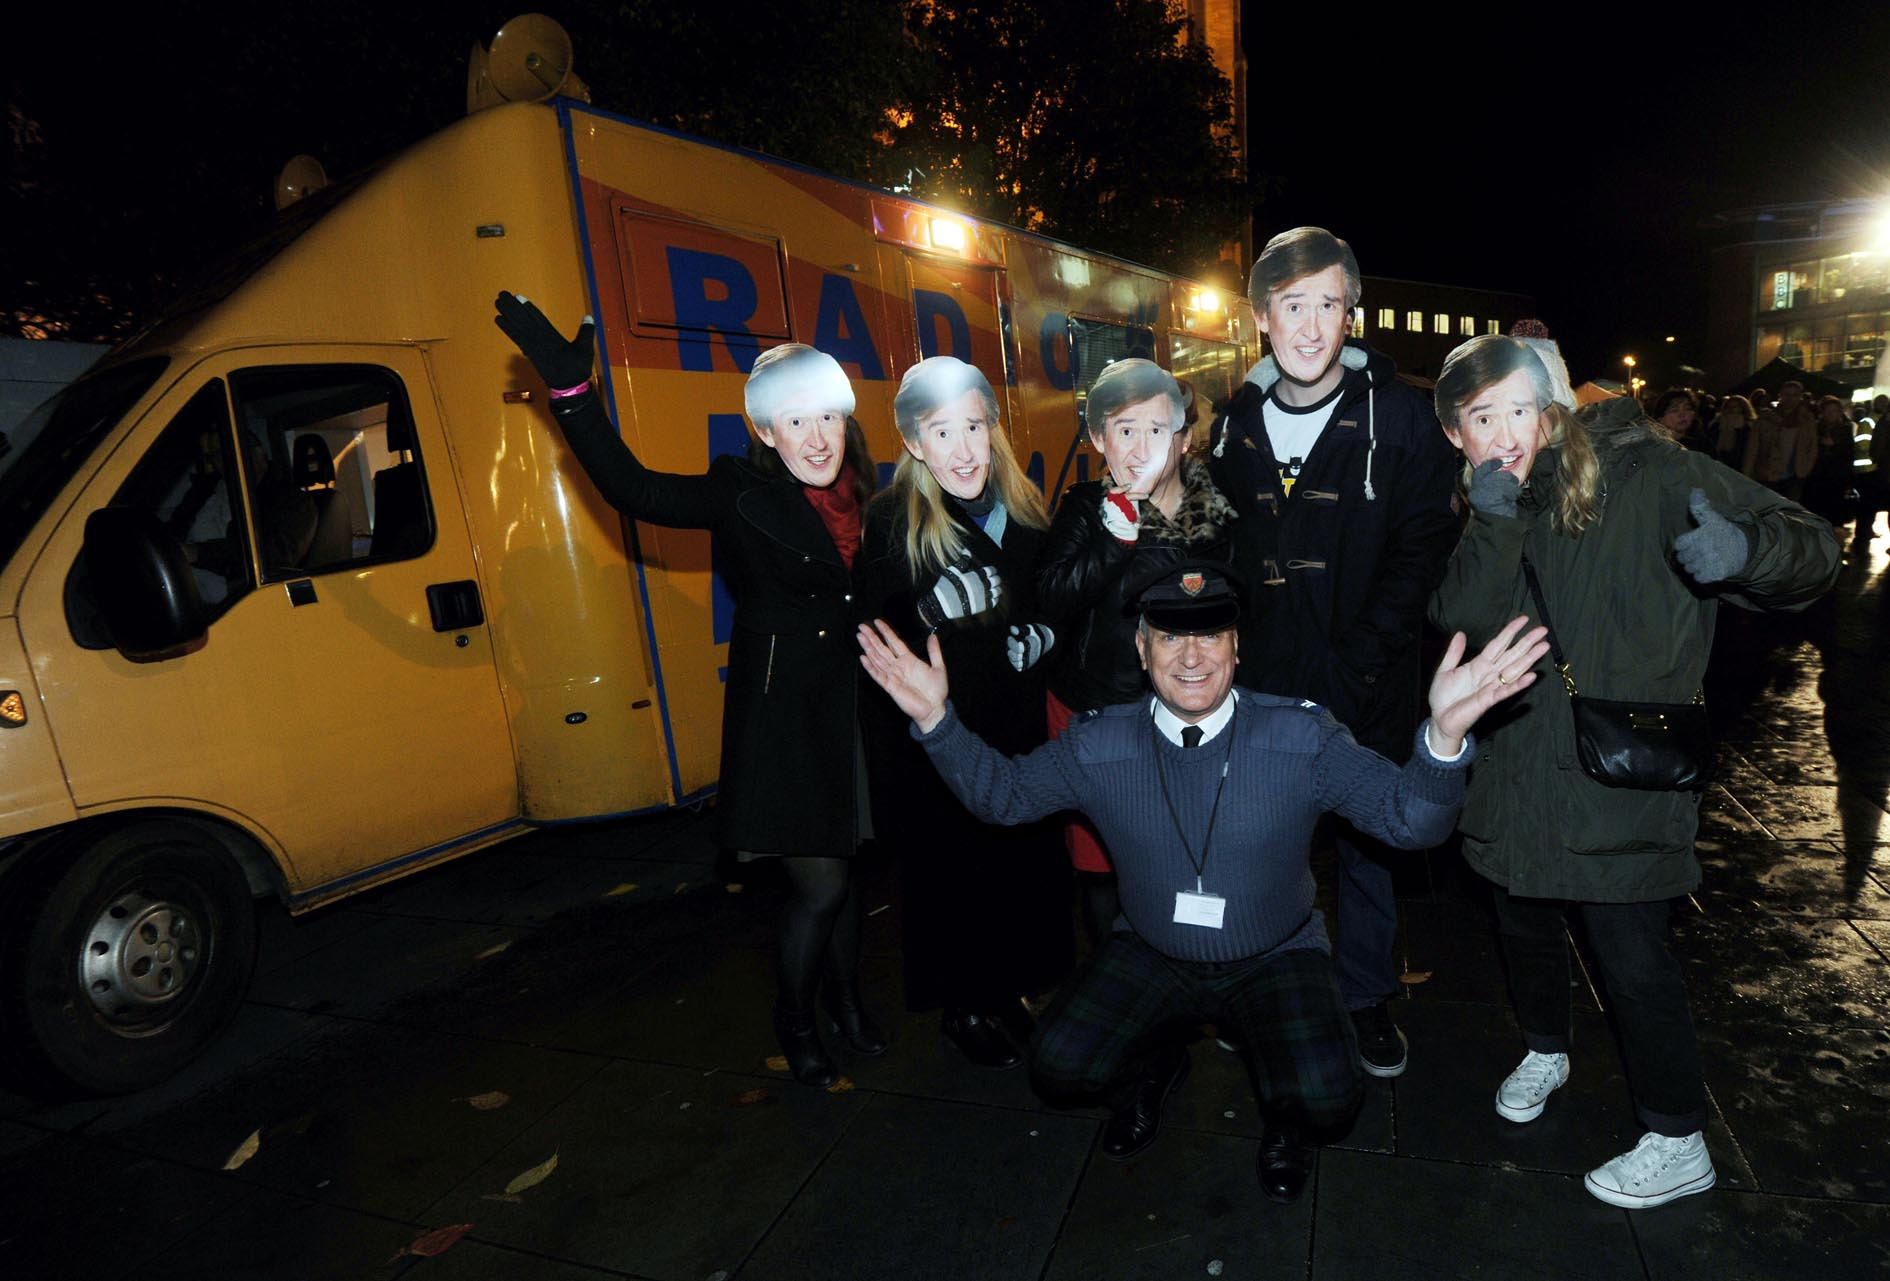 Alan Partridge laser light show brings Norwich Christmas light